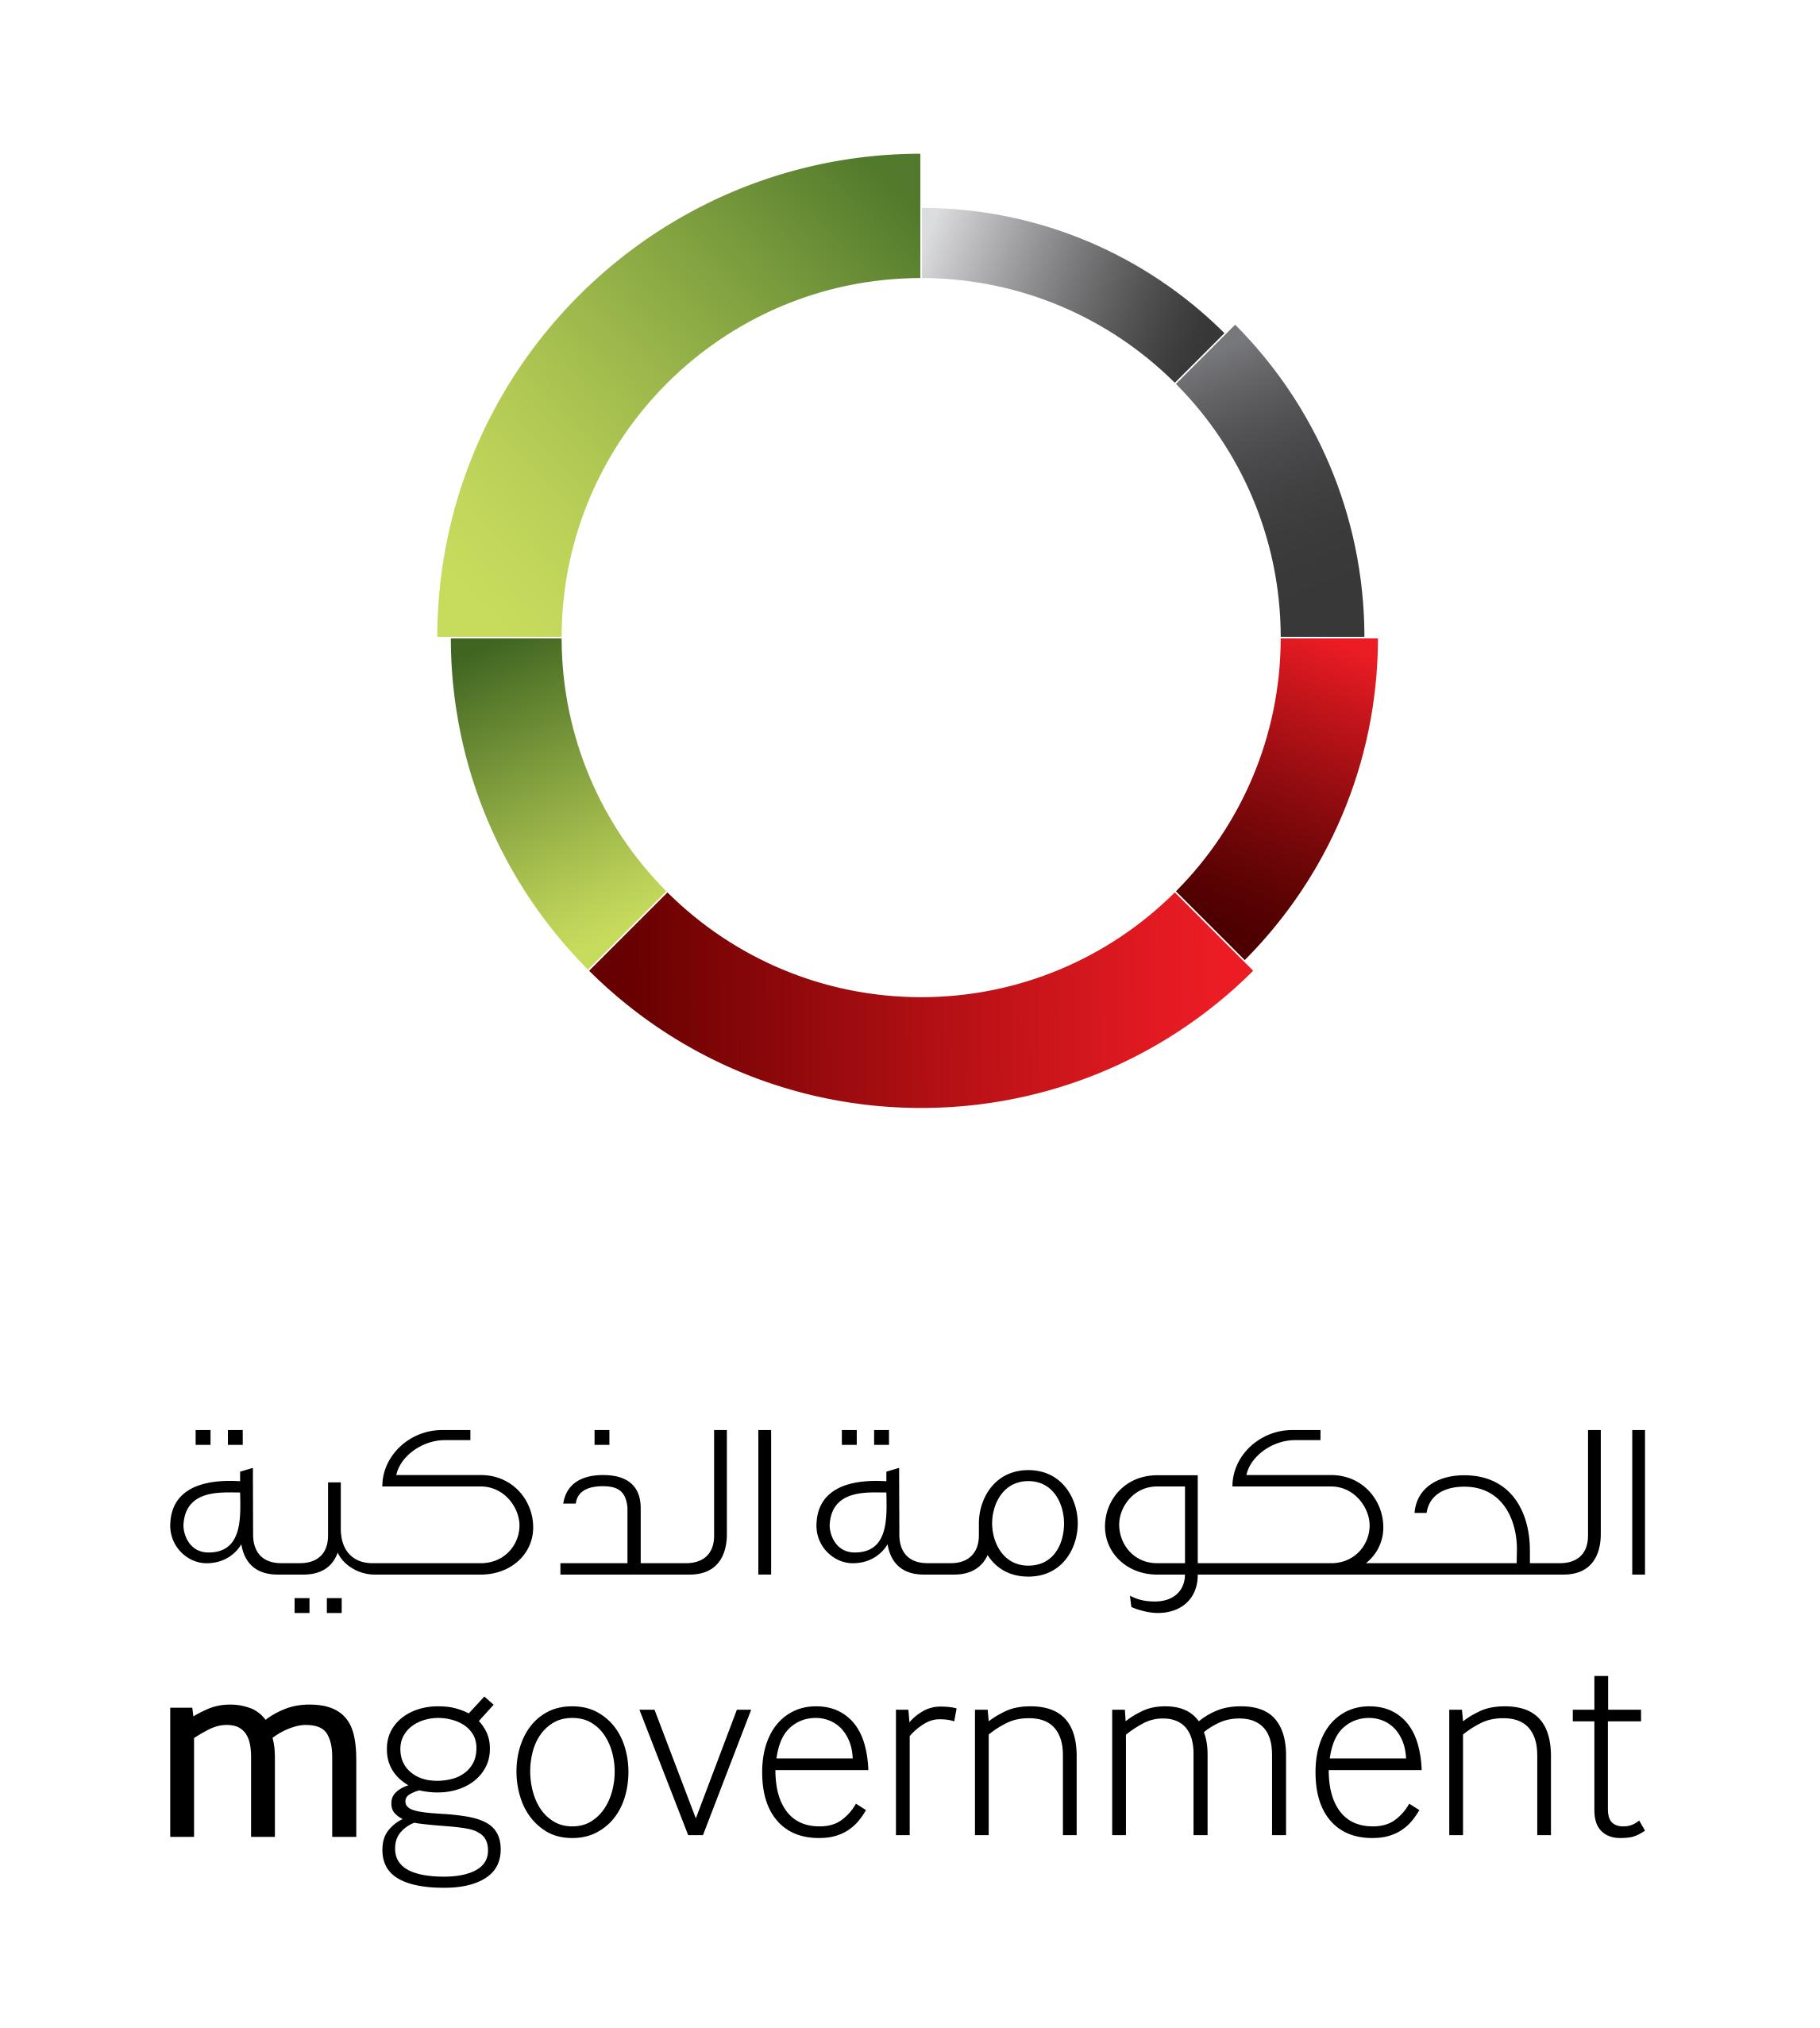 mGovernment_rgb-01